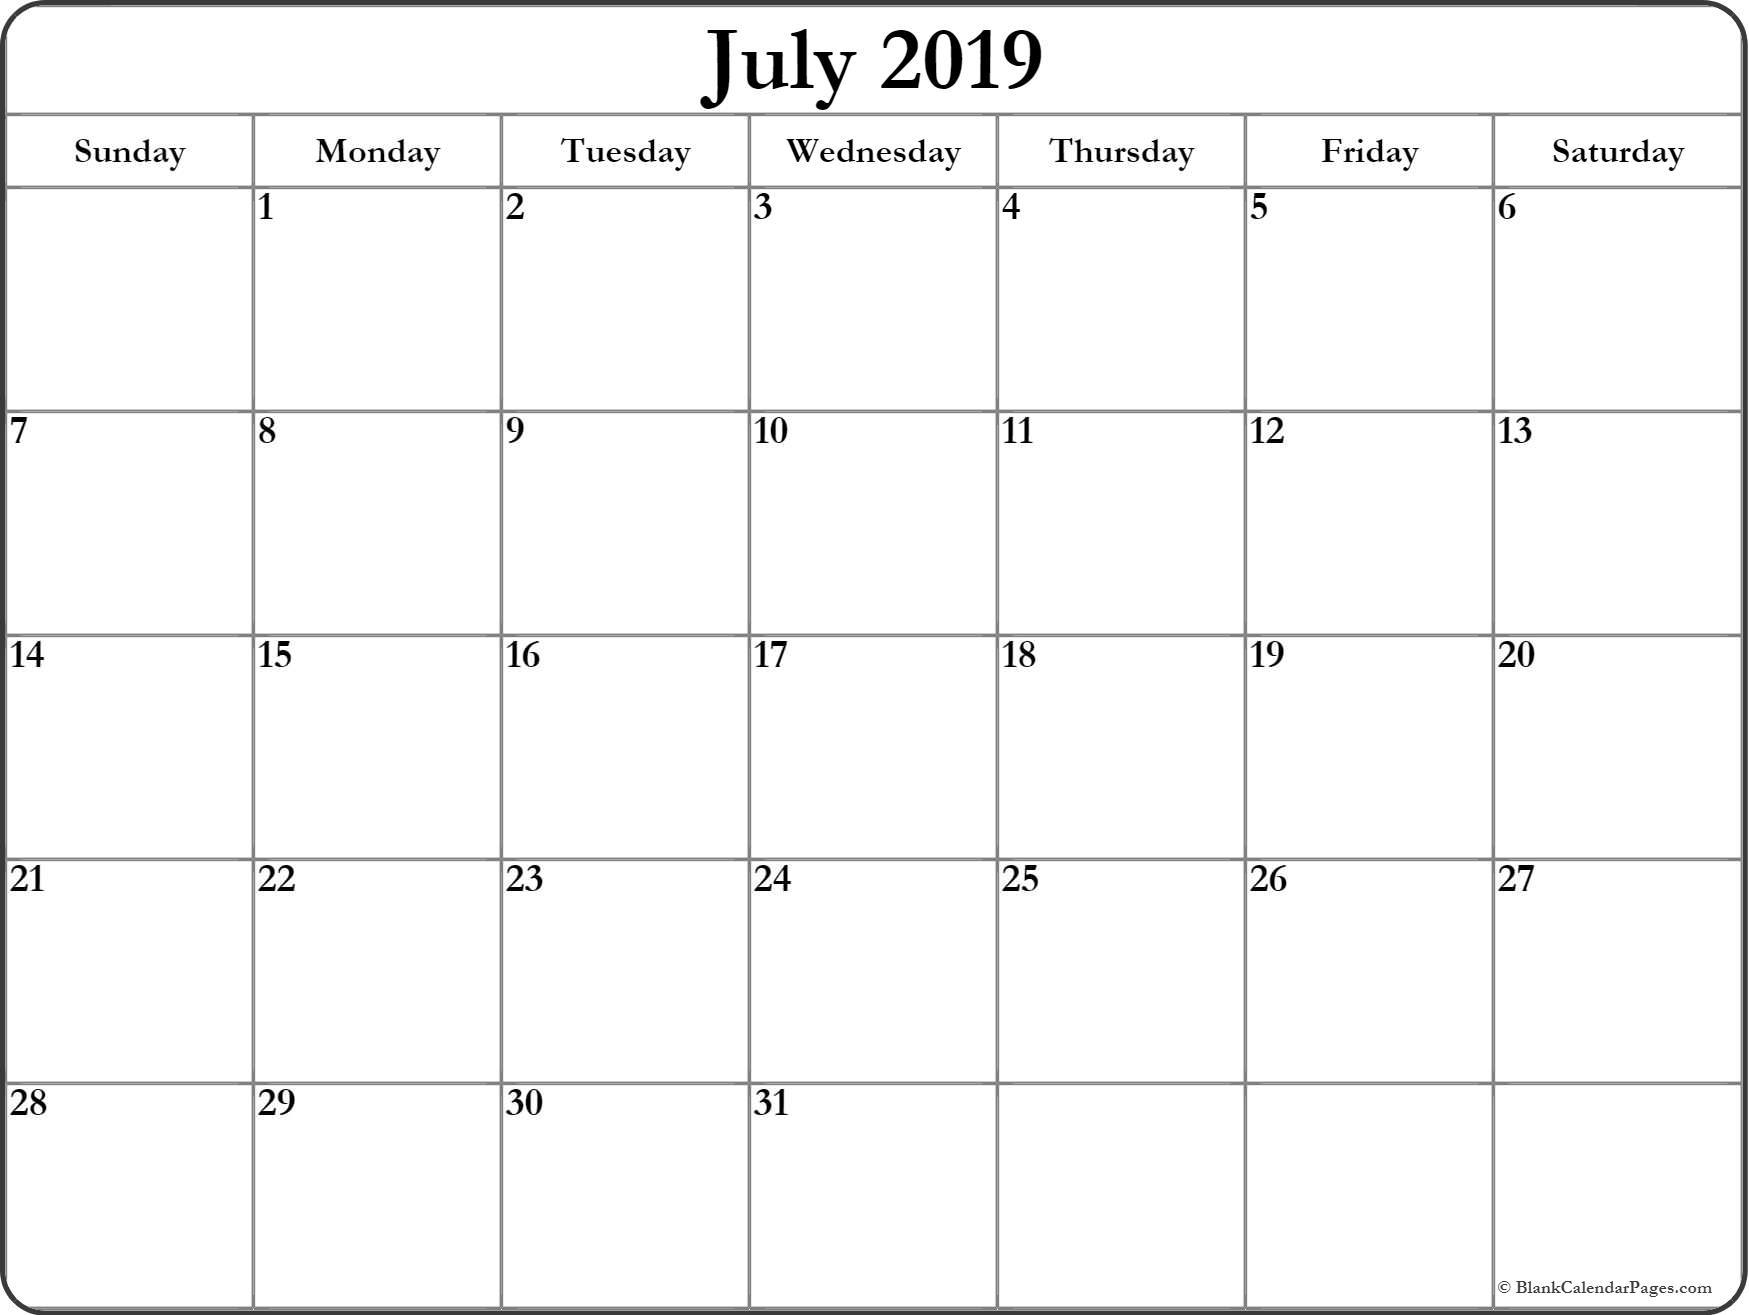 July 2019 Blank Calendar Printable